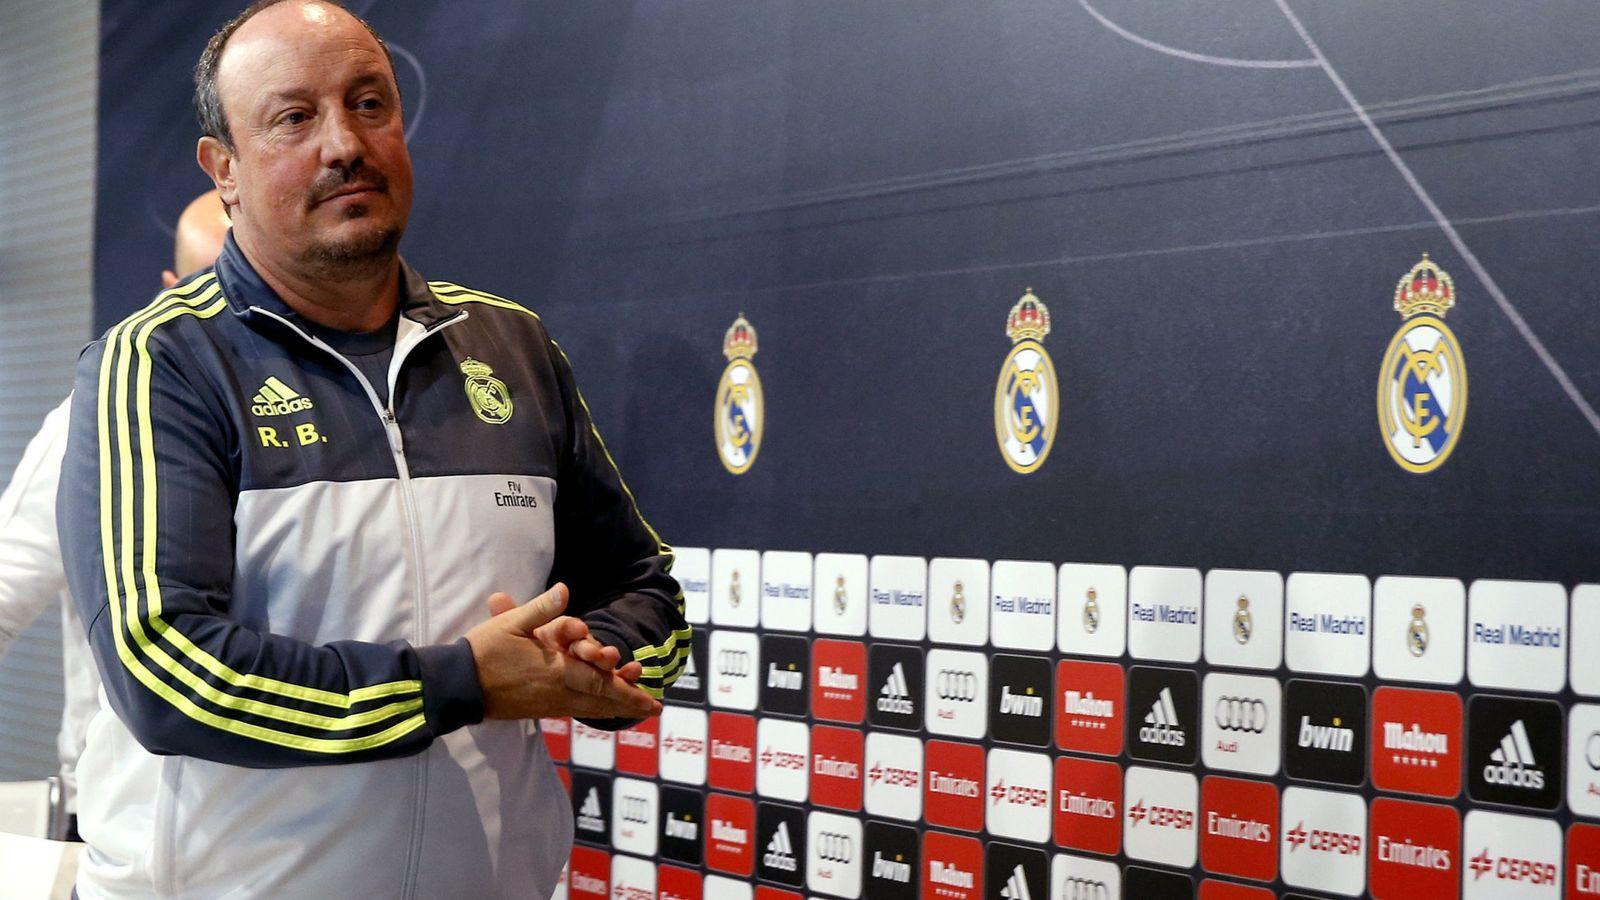 Foto: Rafa Benítez, entrenador del Real Madrid, en rueda de prensa (Efe).